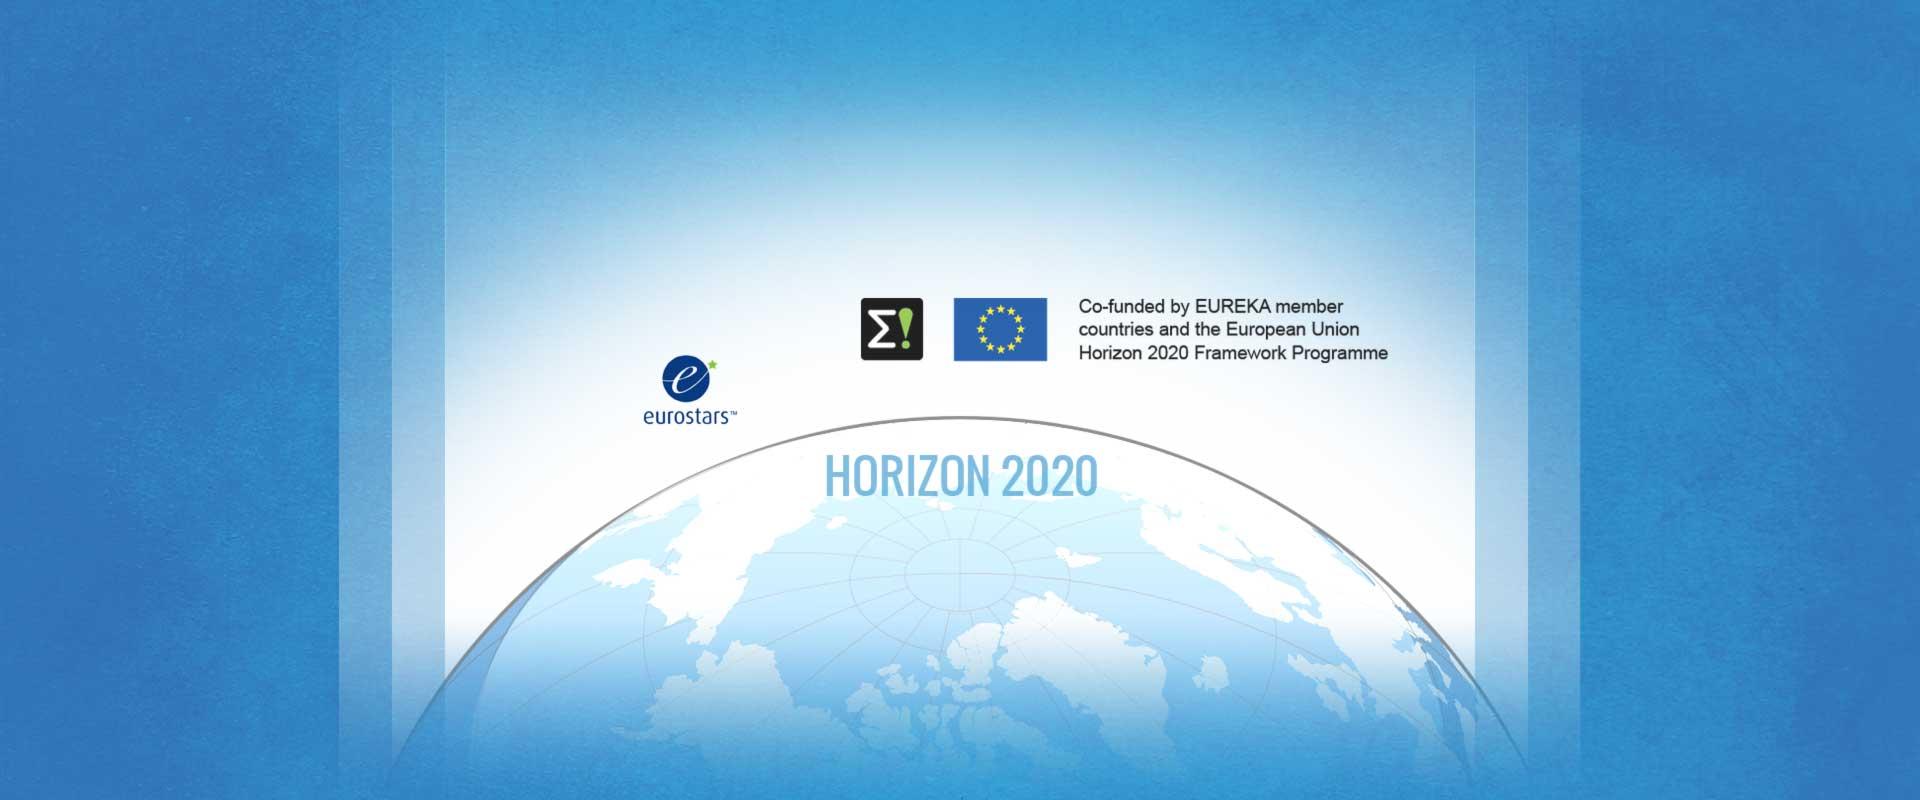 Horizon2020 eurostars eureka